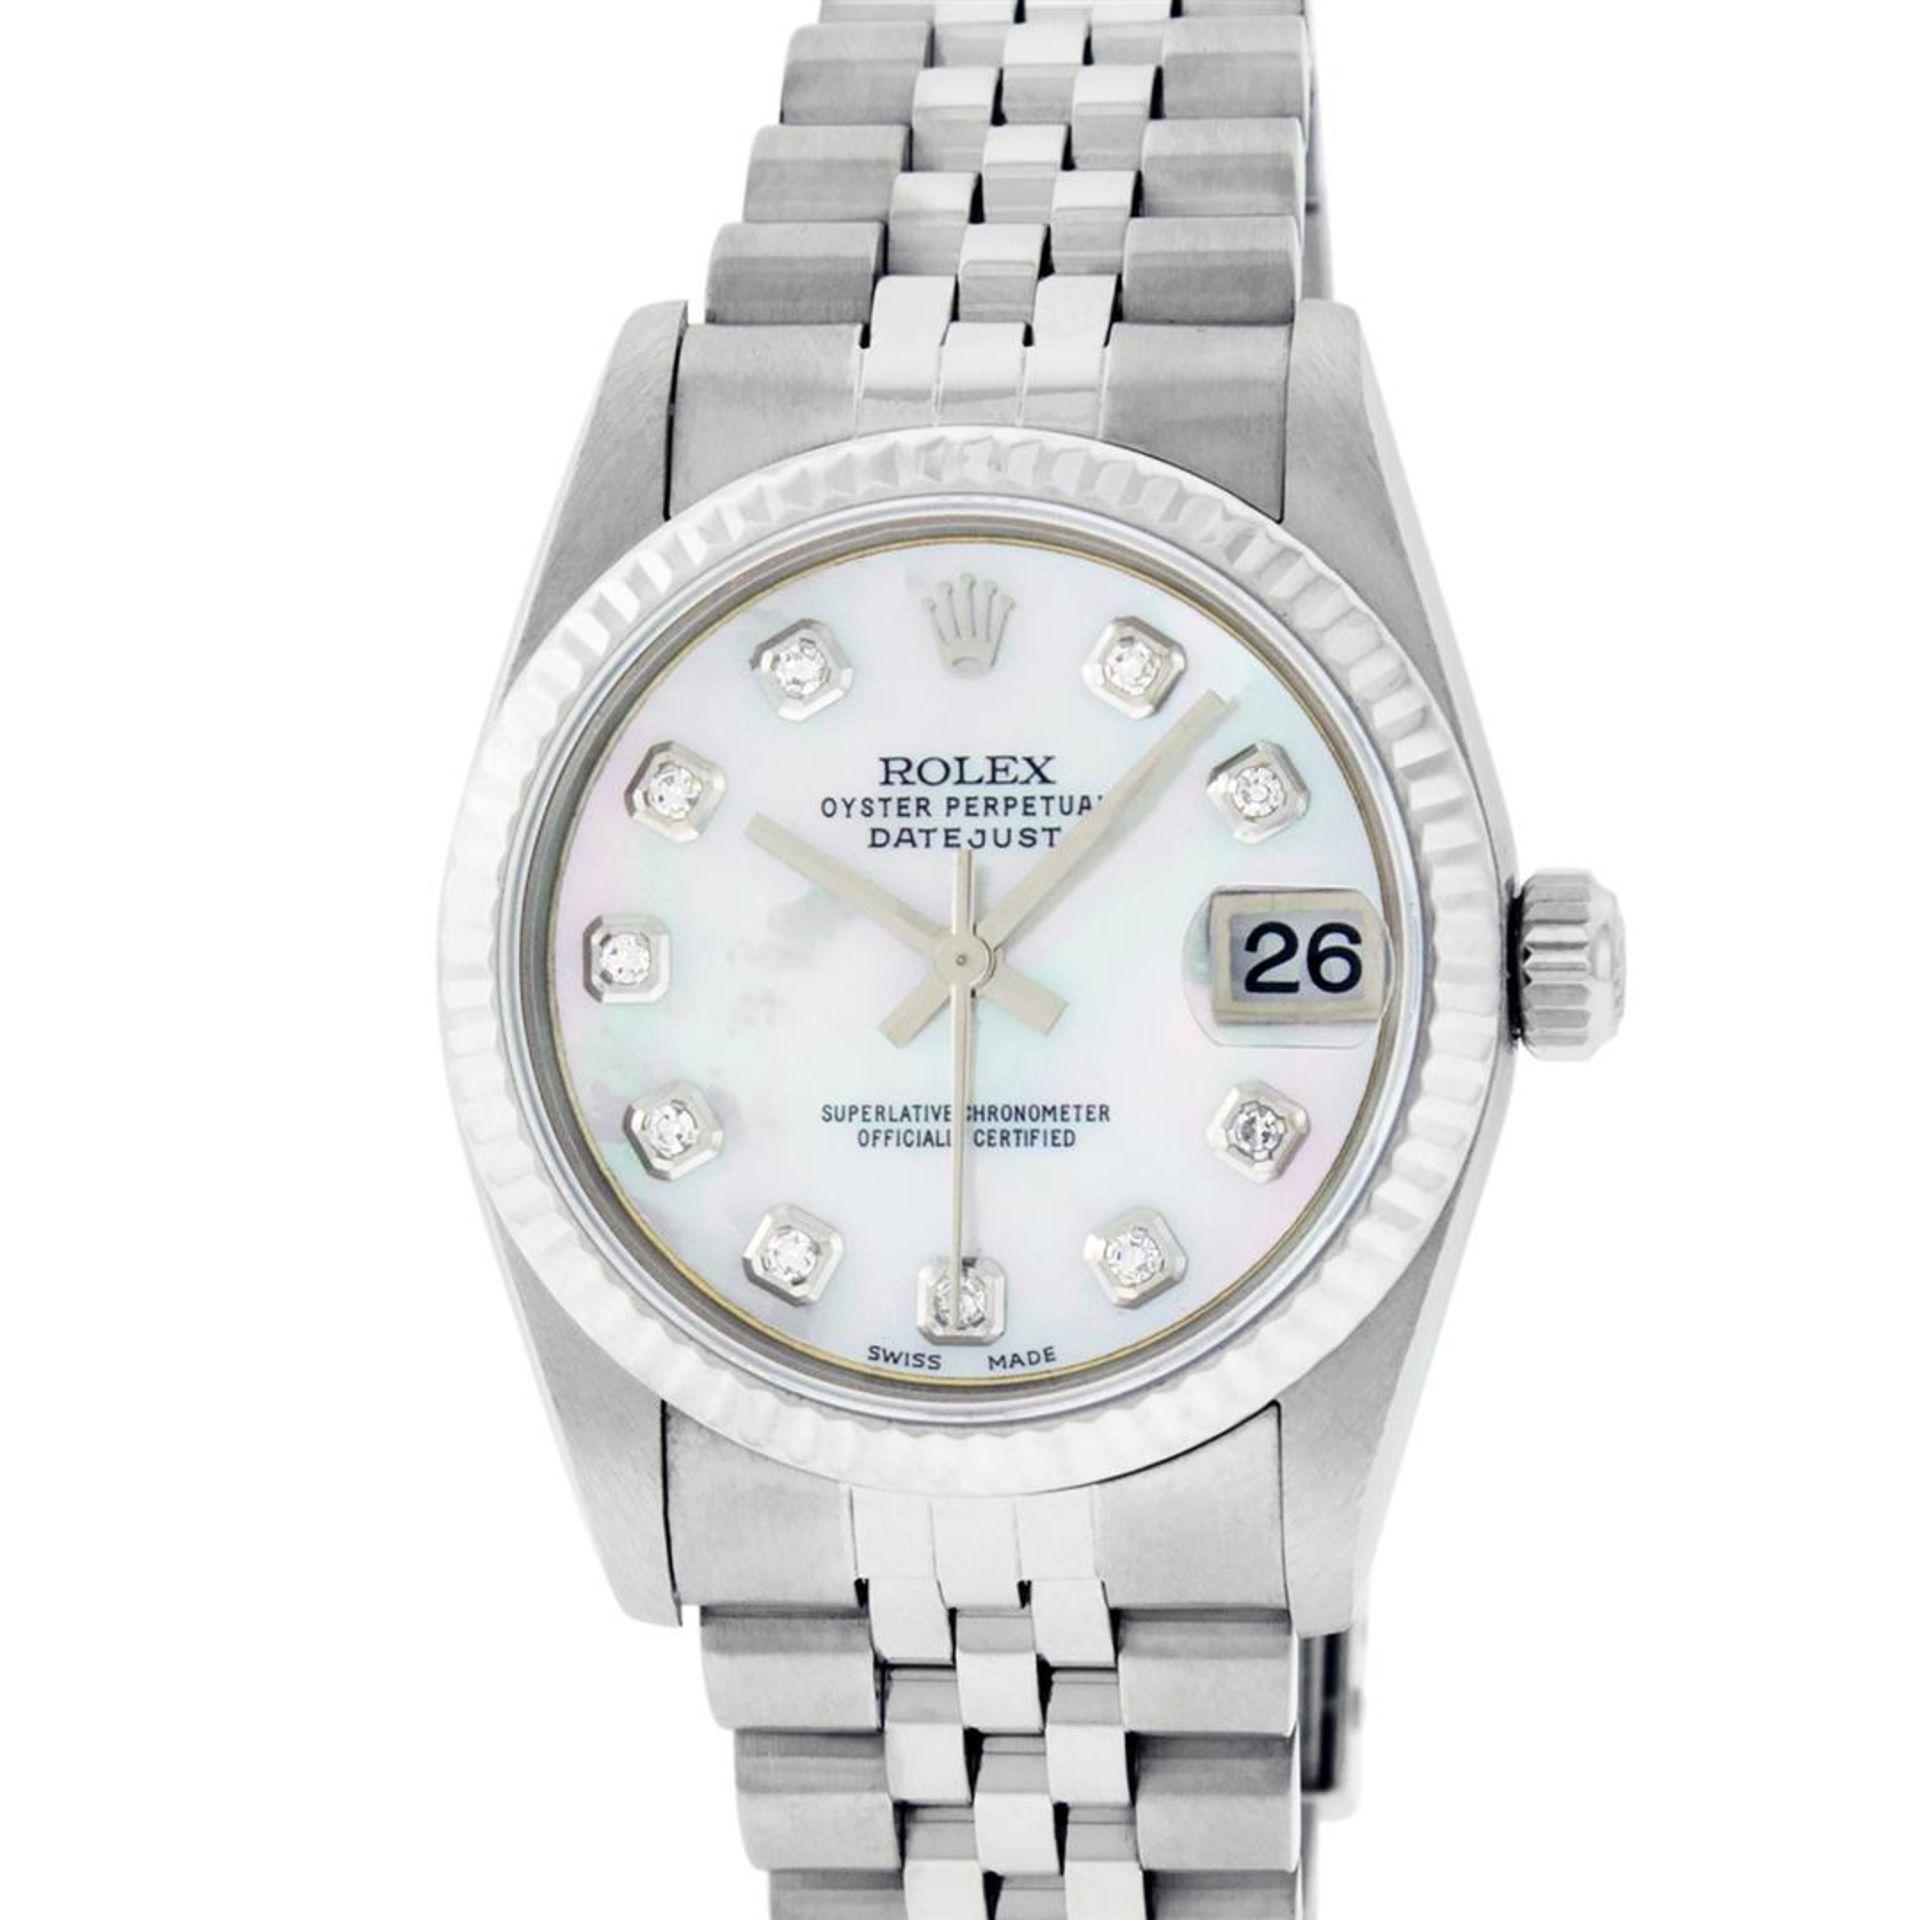 Rolex Womens Midsize Quickset 31mm MOP Diamond Stainless Steel Datejust Wriswatc - Image 2 of 9